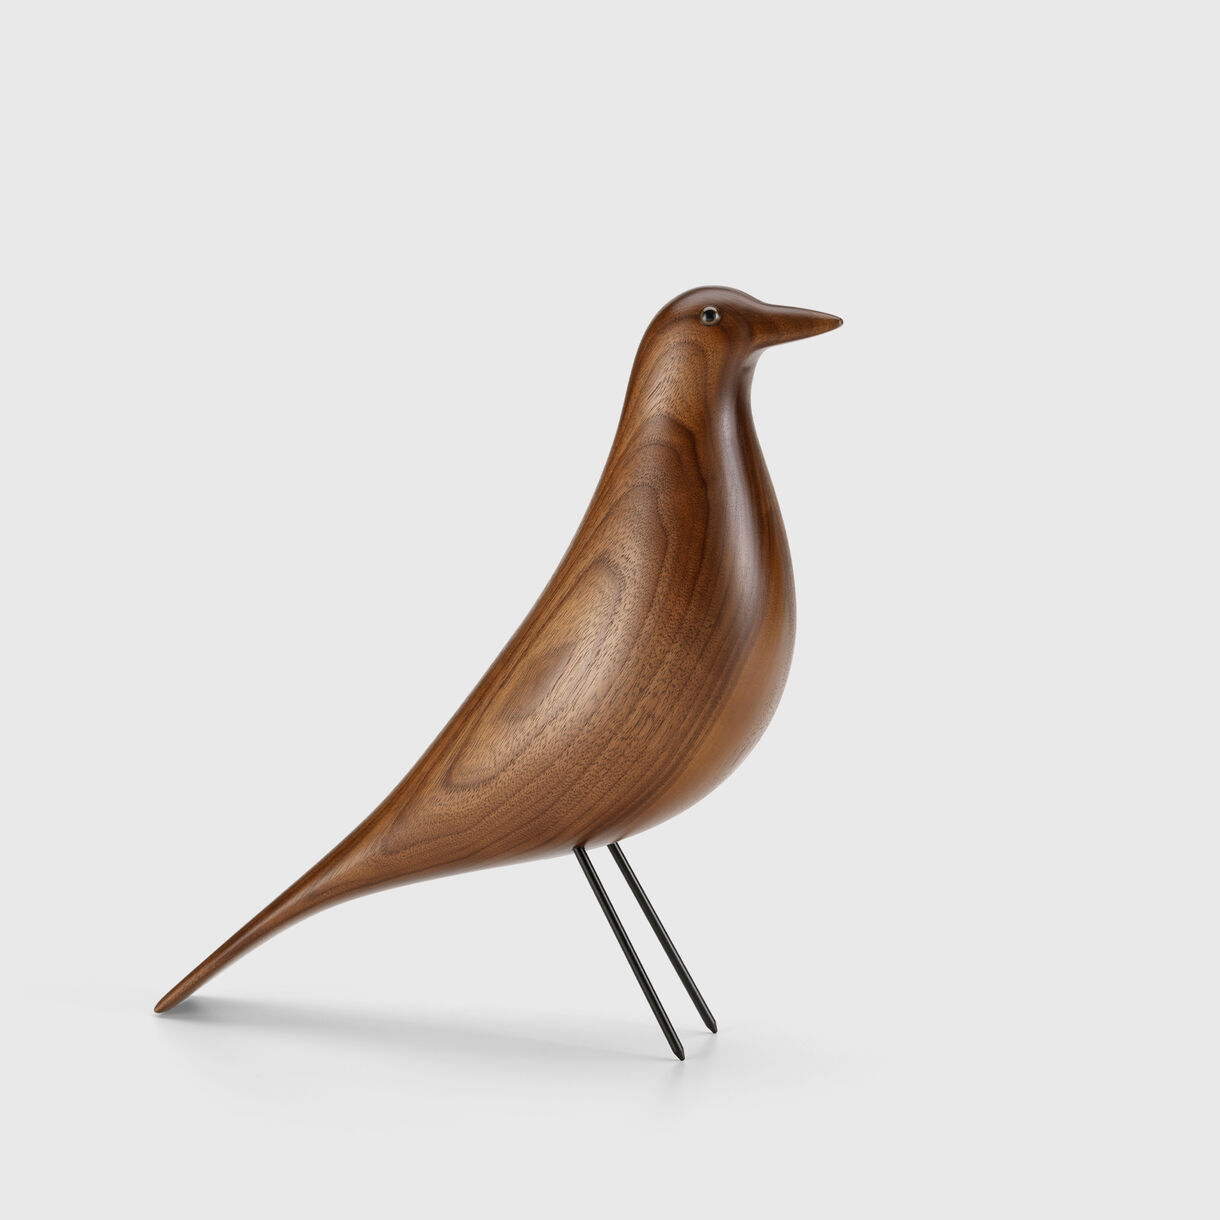 Eames House Bird, Walnut